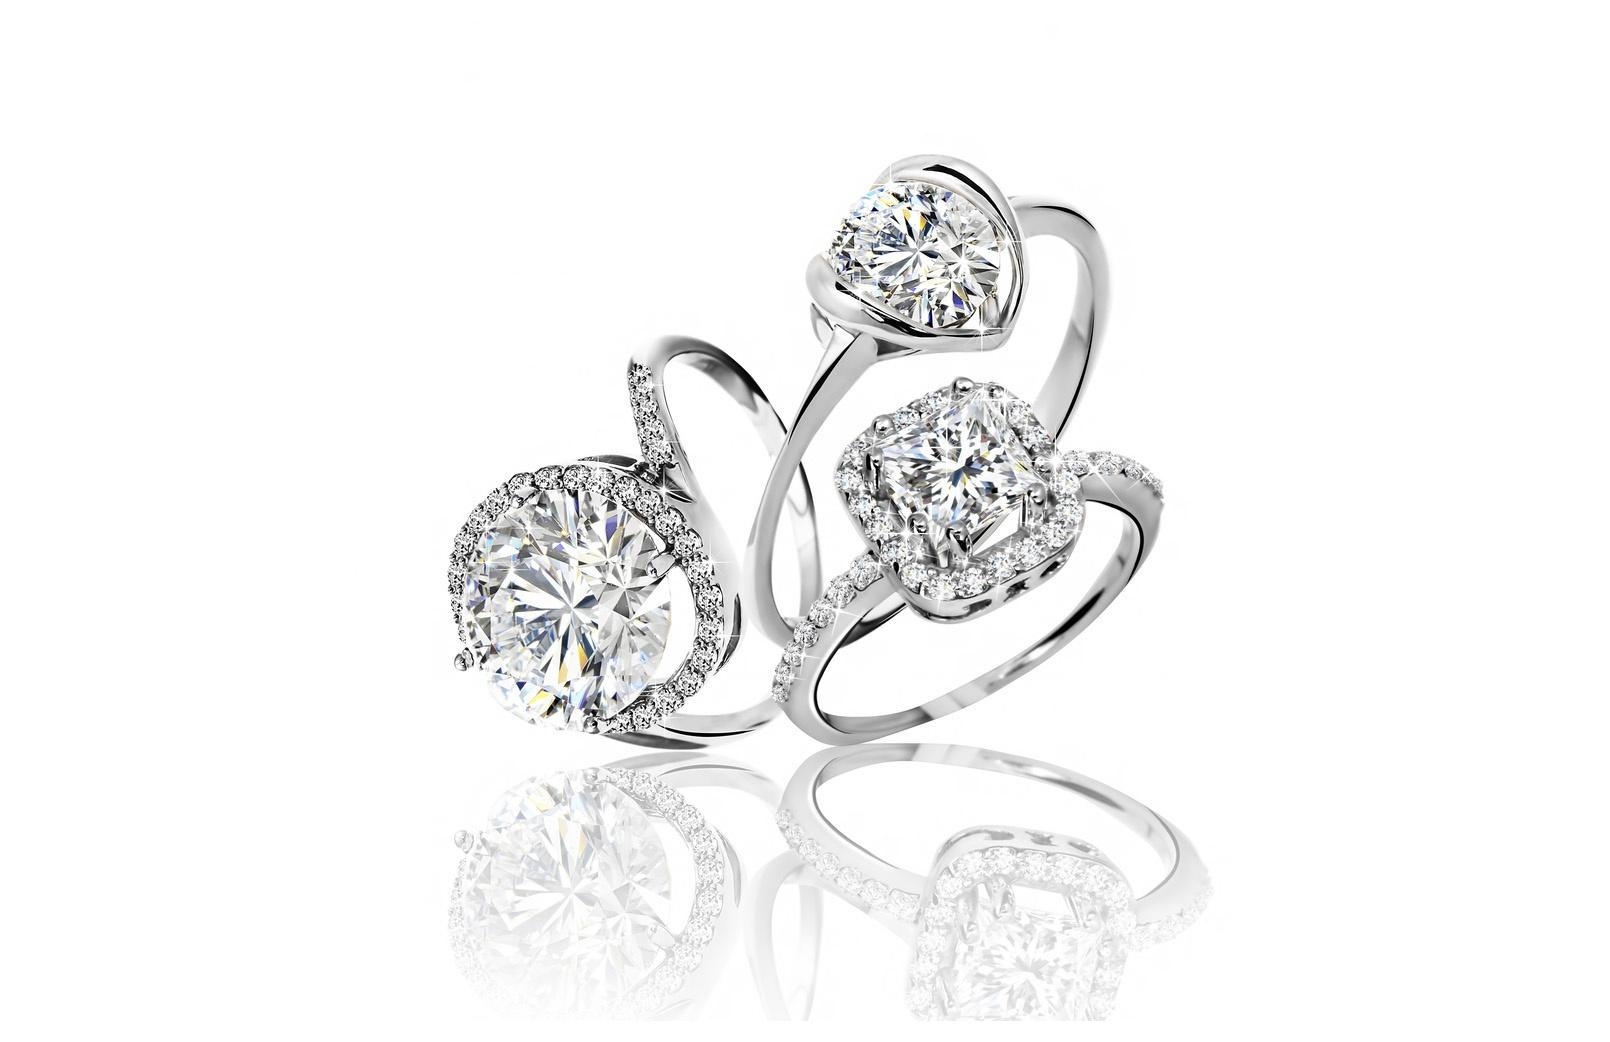 Diamond-Engagement-Rings-Central-Coast.jpg